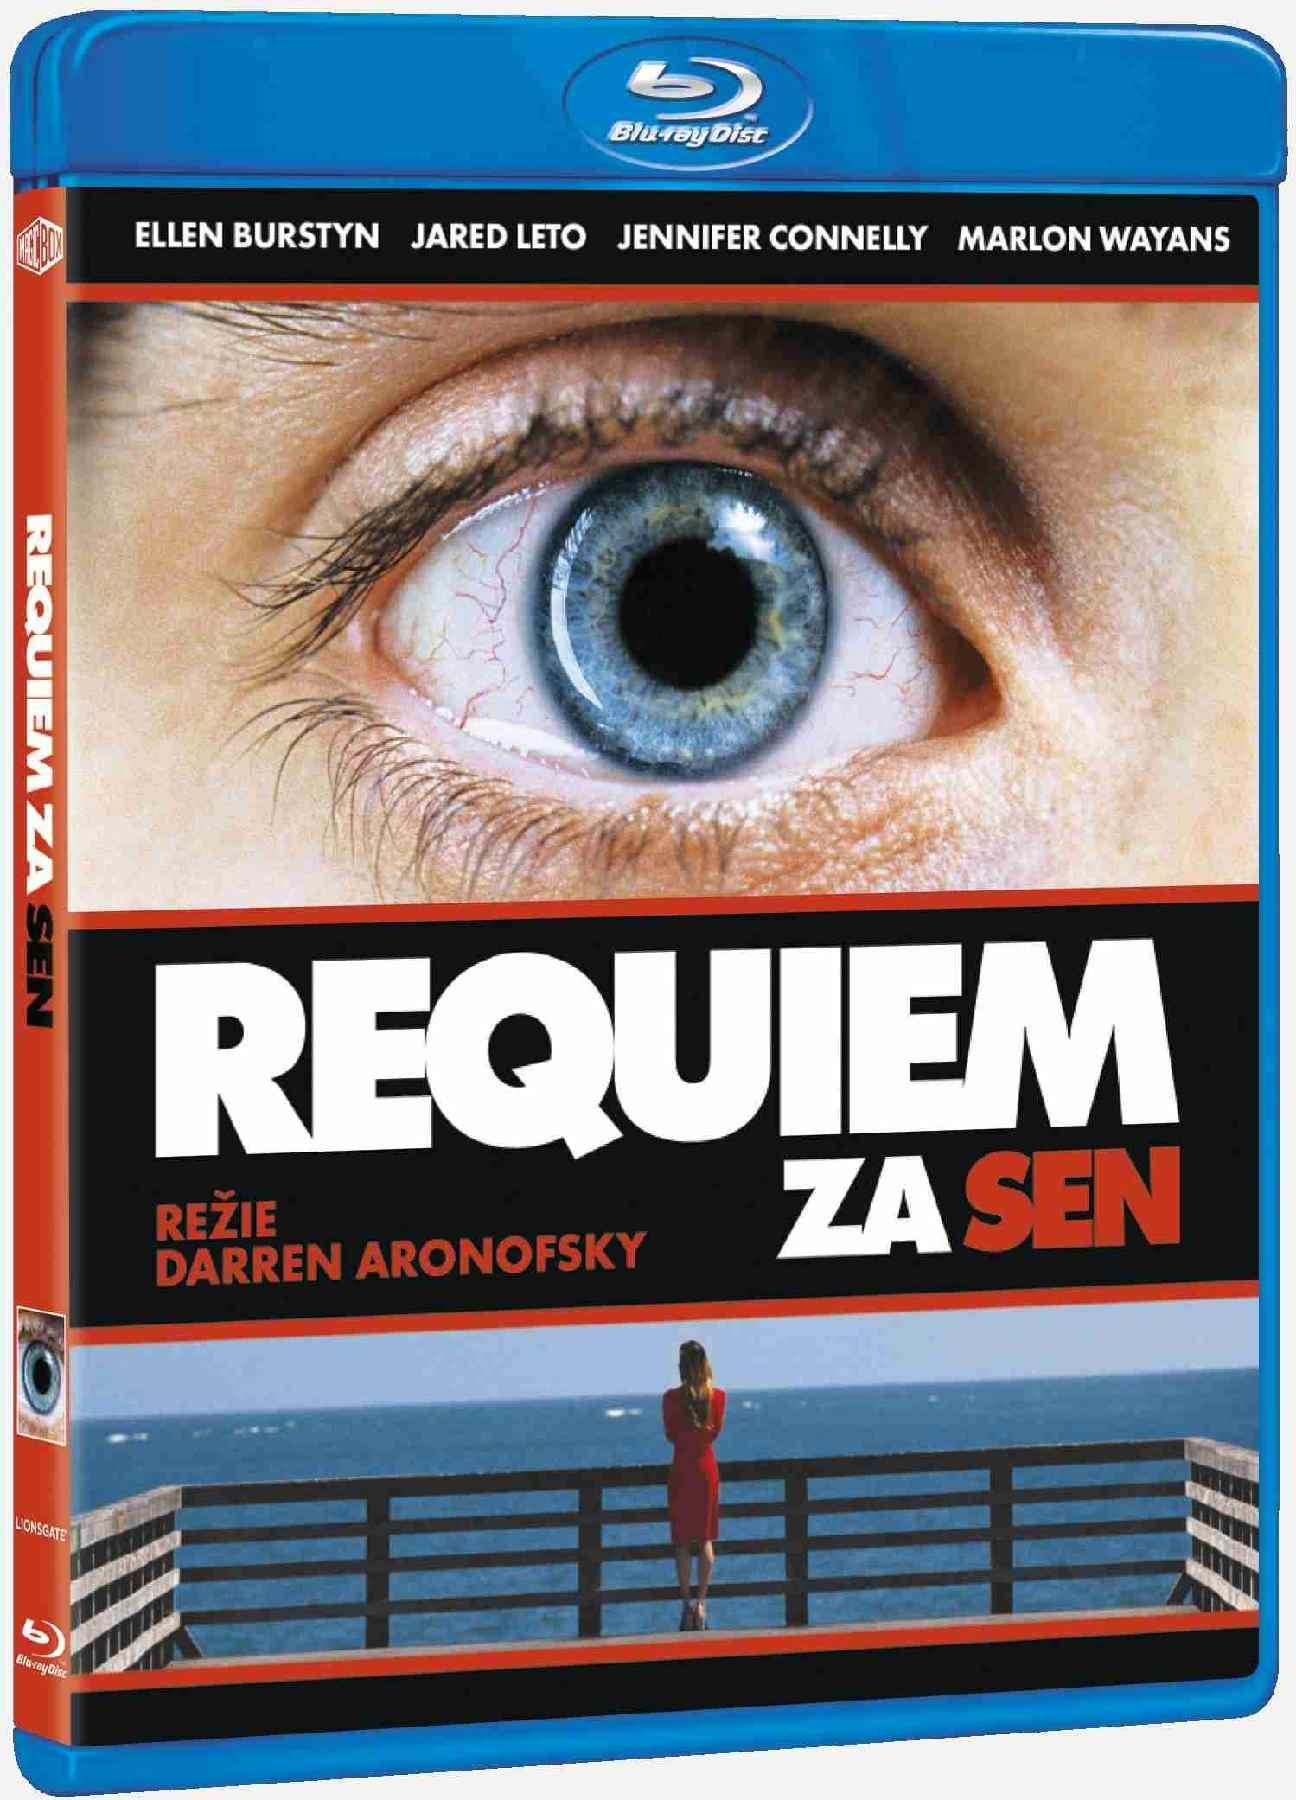 REQUIEM ZA SEN - Blu-ray